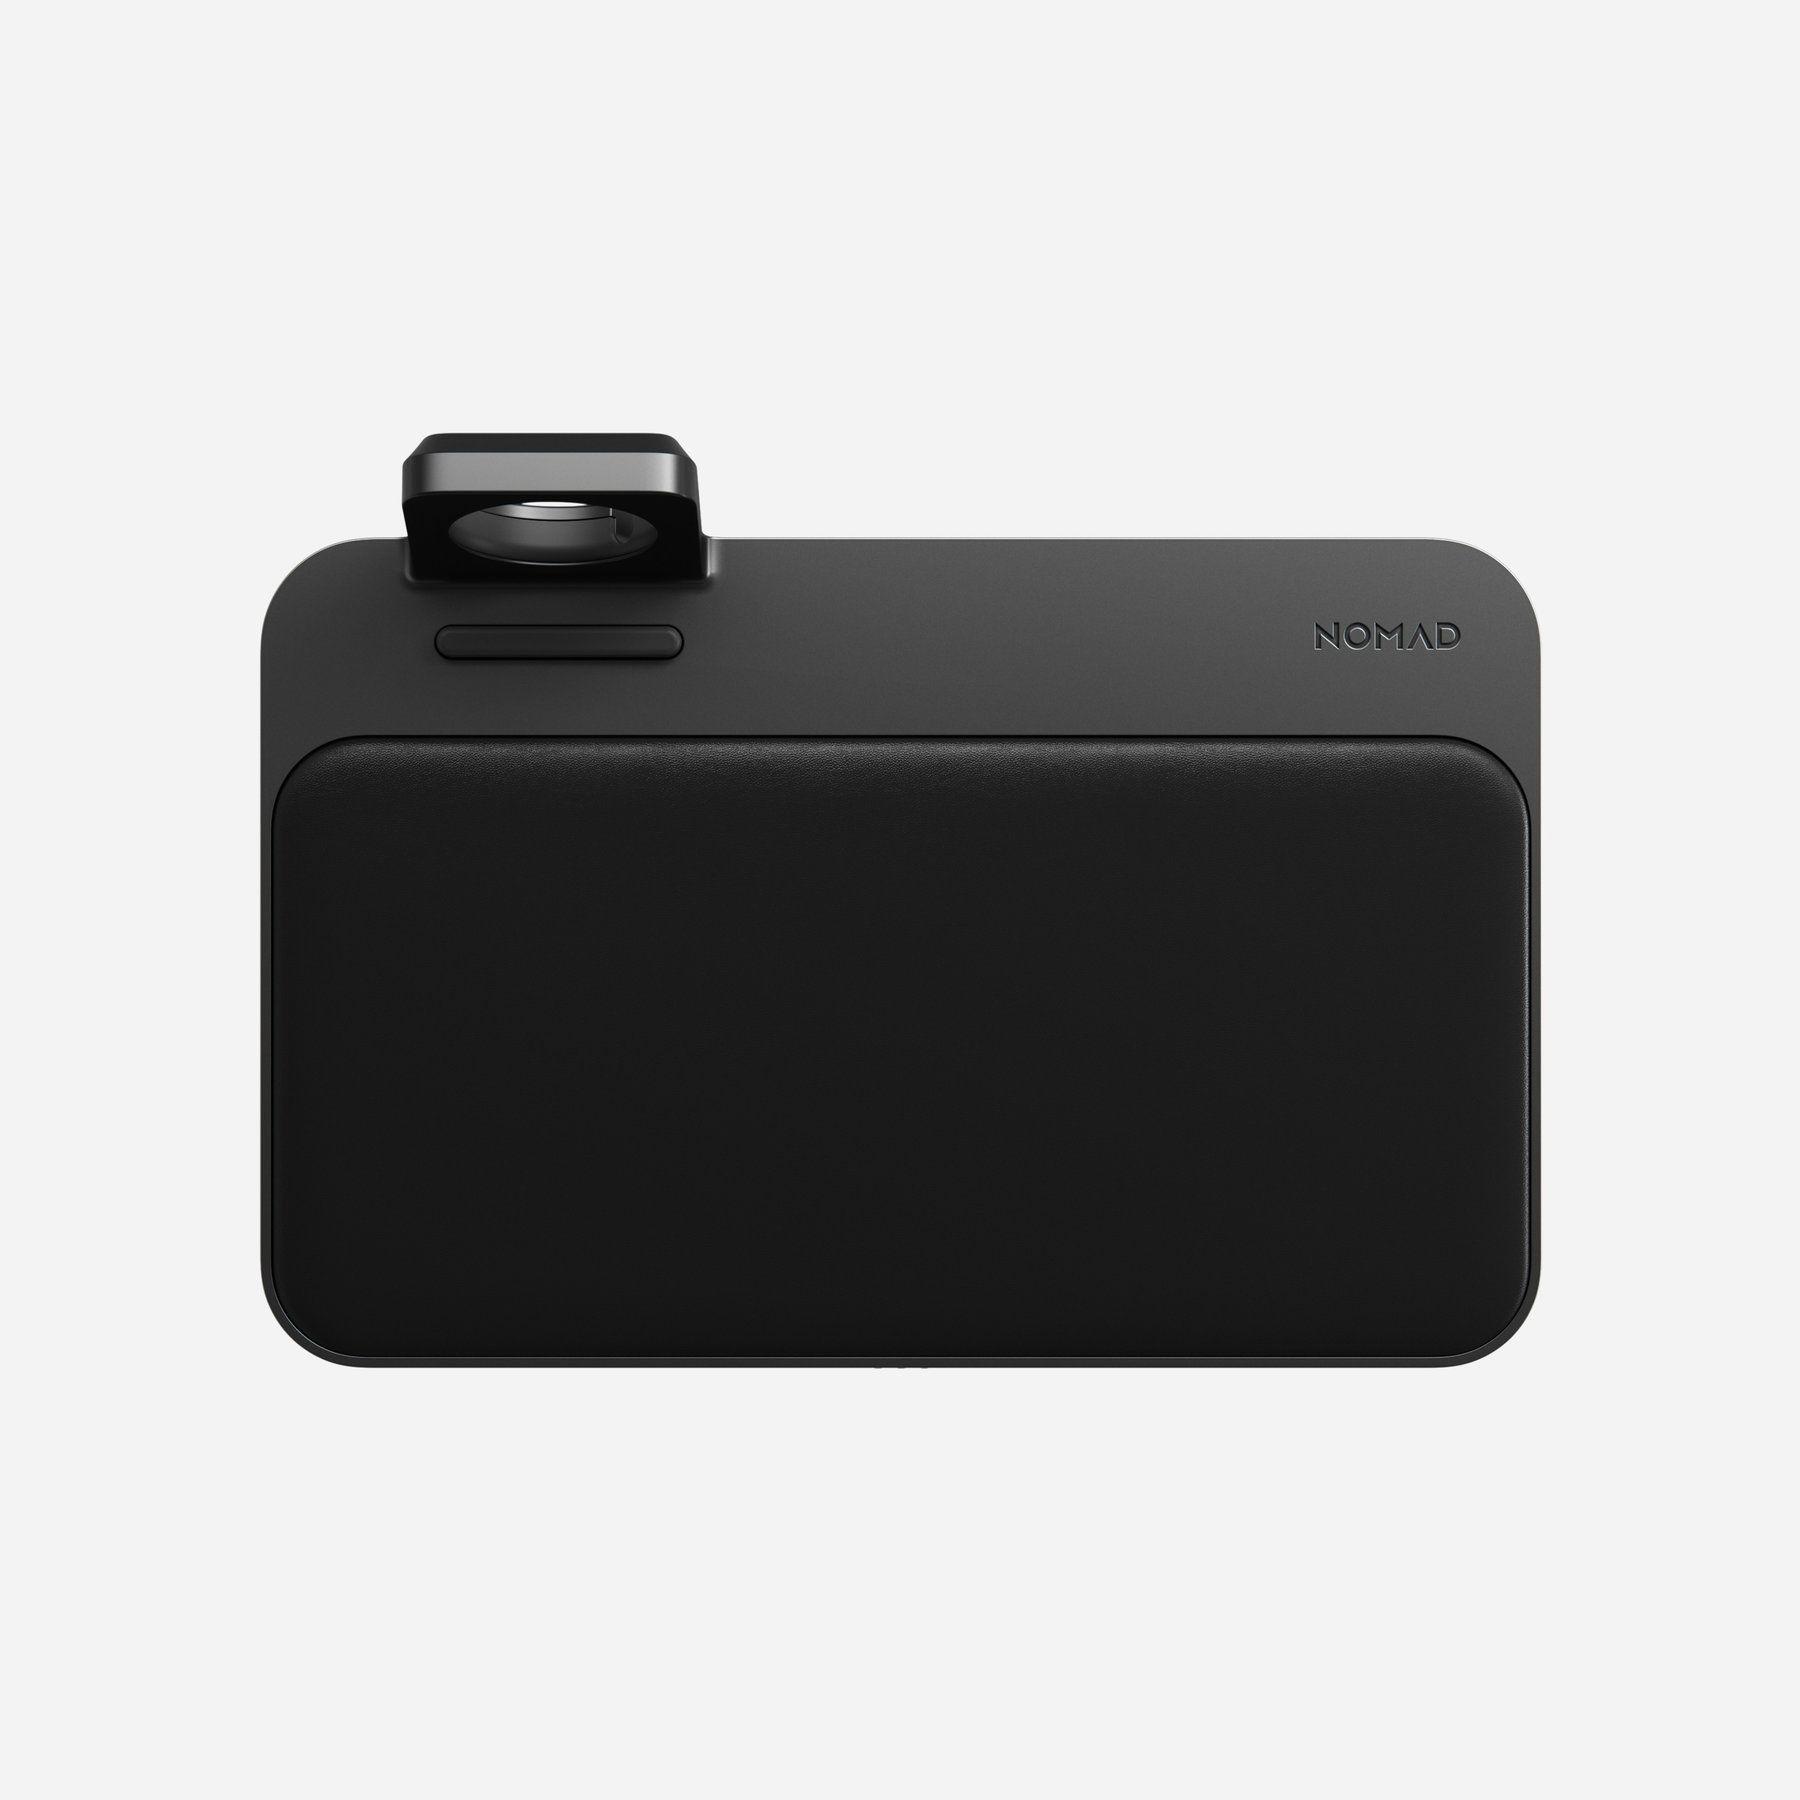 Base Station Apple Watch Mount Edition Nomad Apple Watch Apple Watch Charger Apple Watch Charging